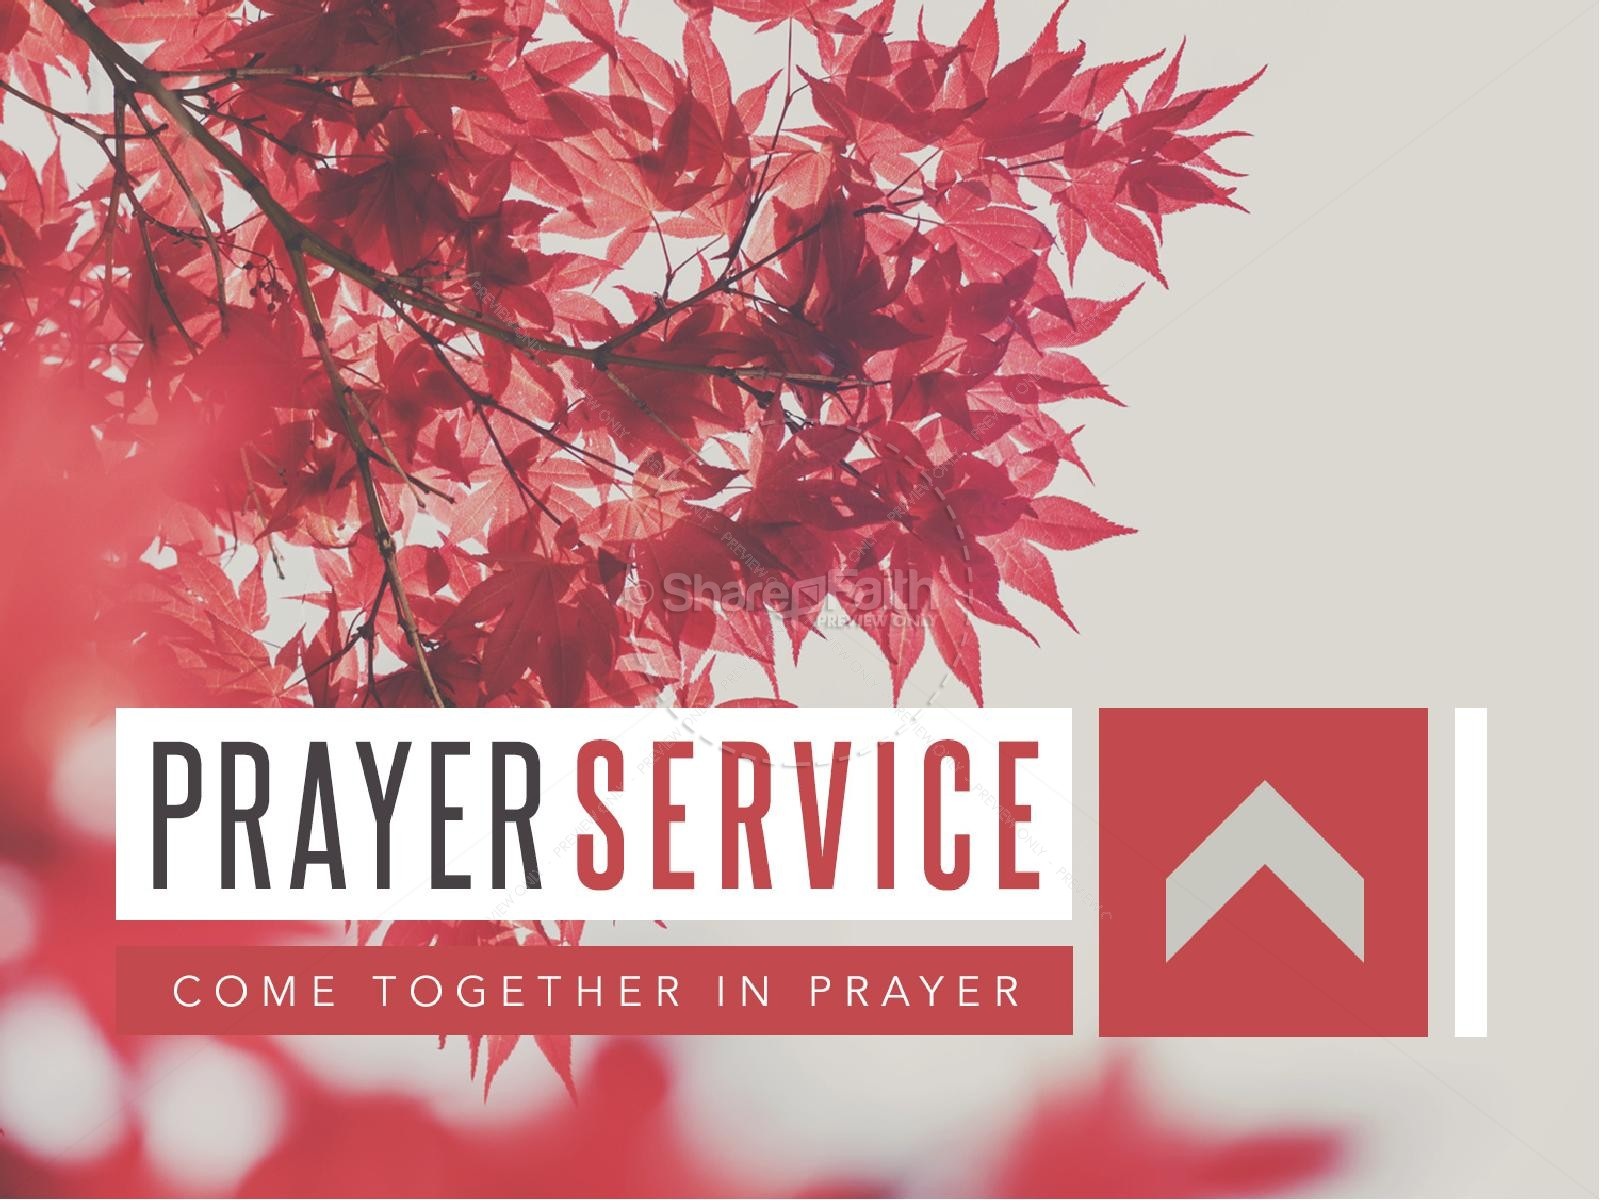 Prayer Service Ministry Powerpoint